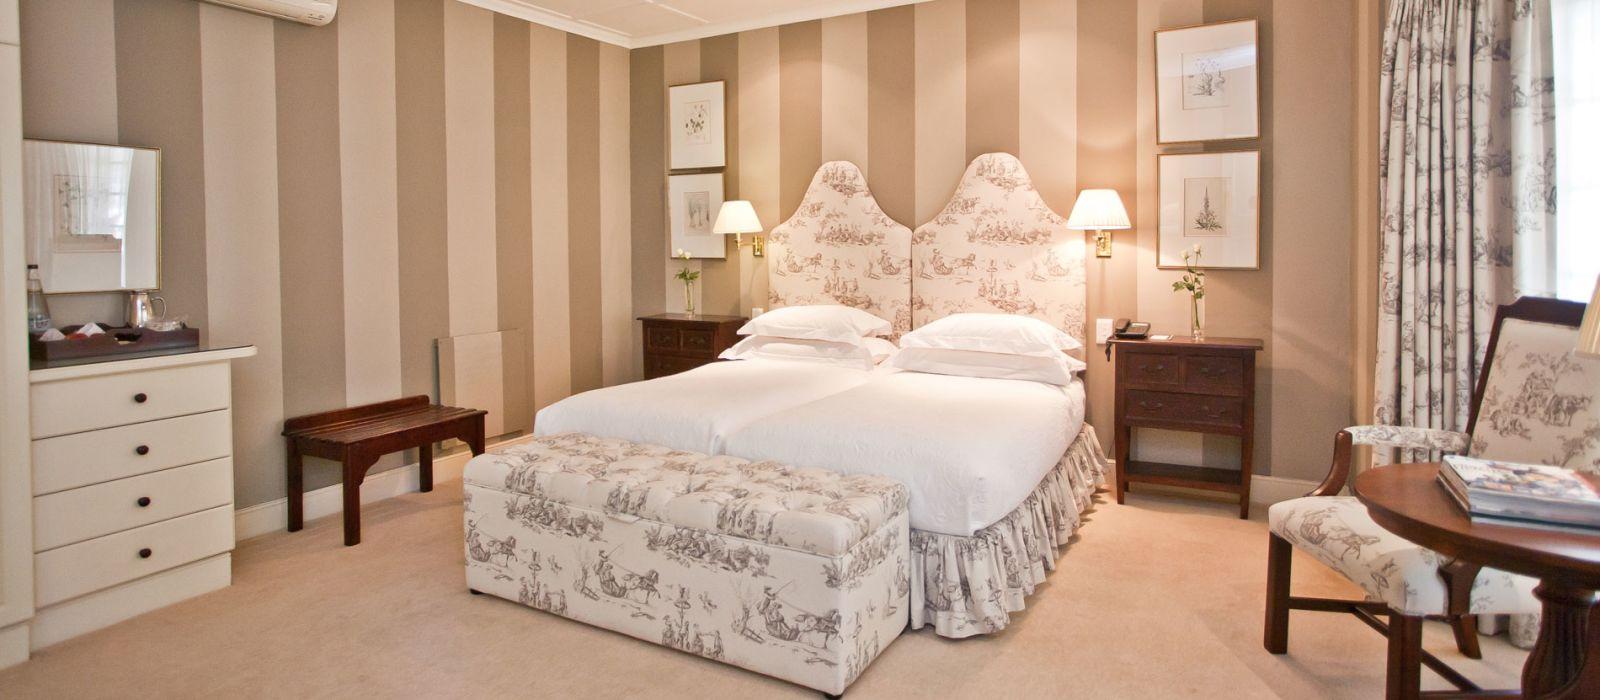 Hotel Rosenhof Country House South Africa